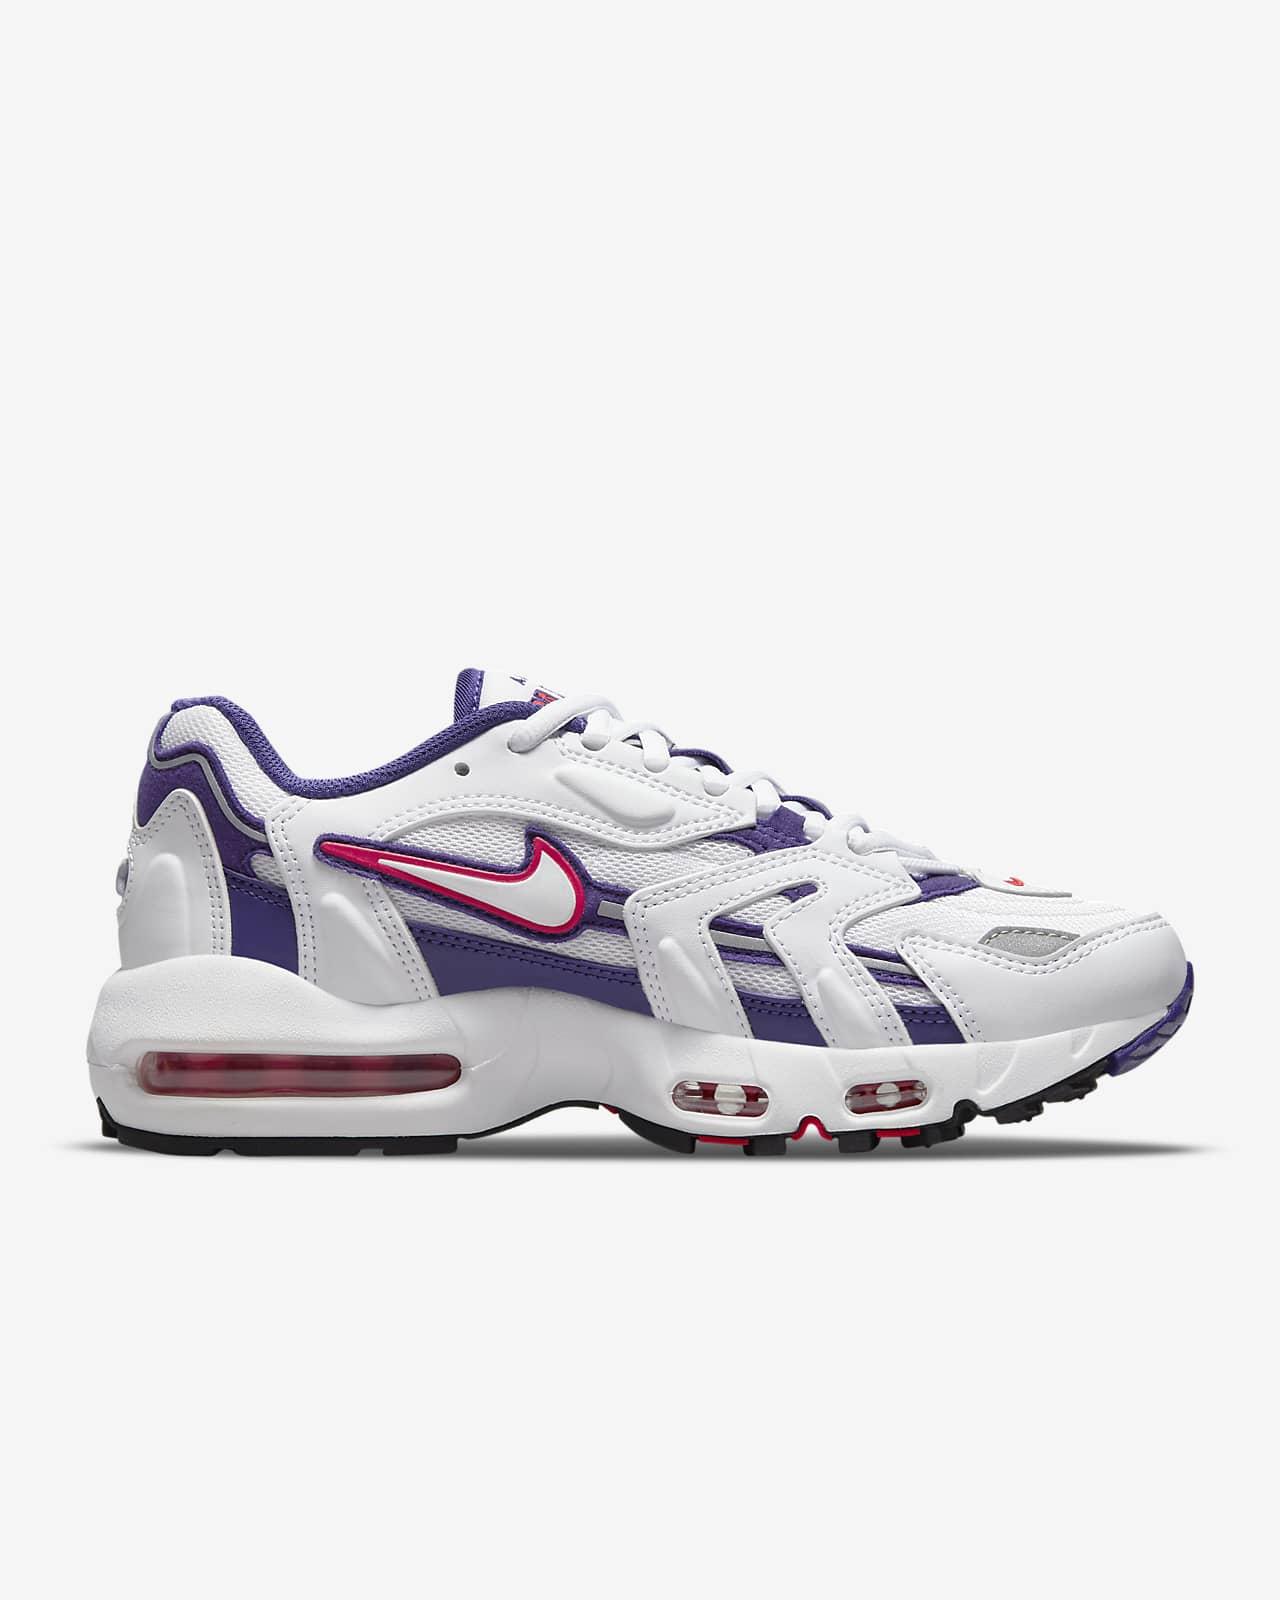 Nike Air Max 96 II Women's Shoes